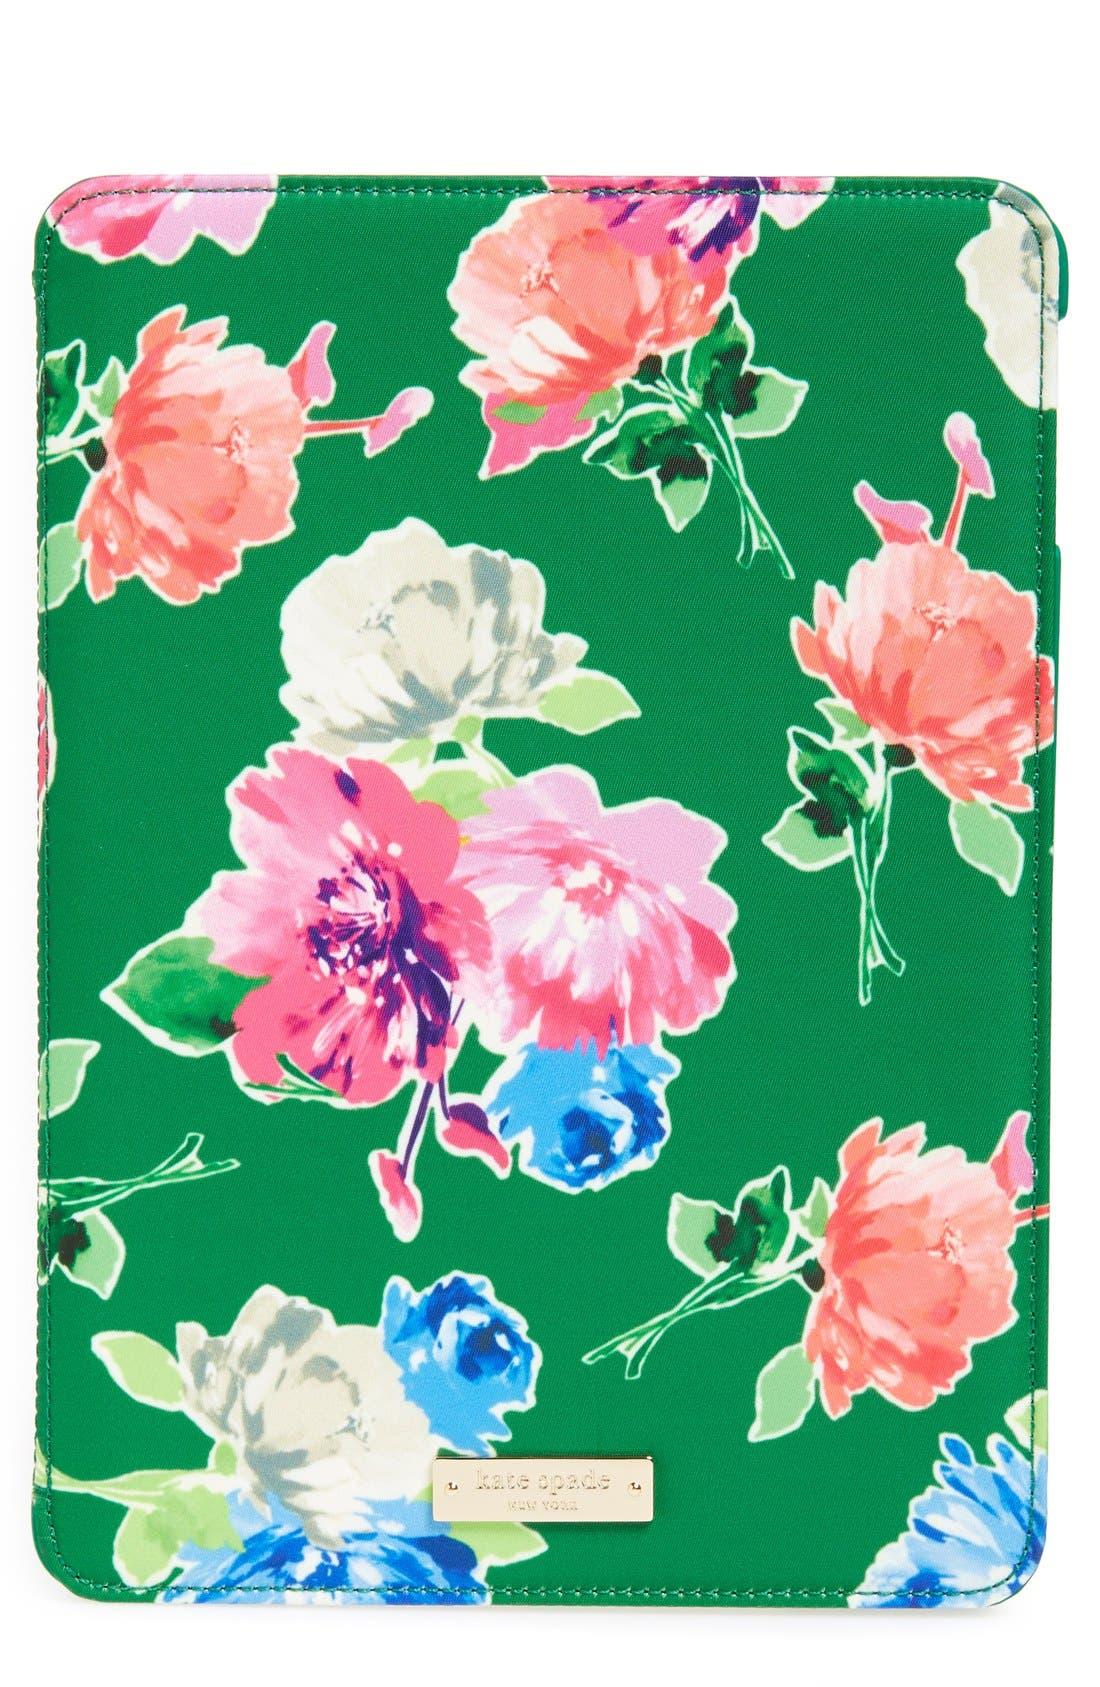 Alternate Image 1 Selected - kate spade new york 'spring blooms' iPad Air hardcase folio